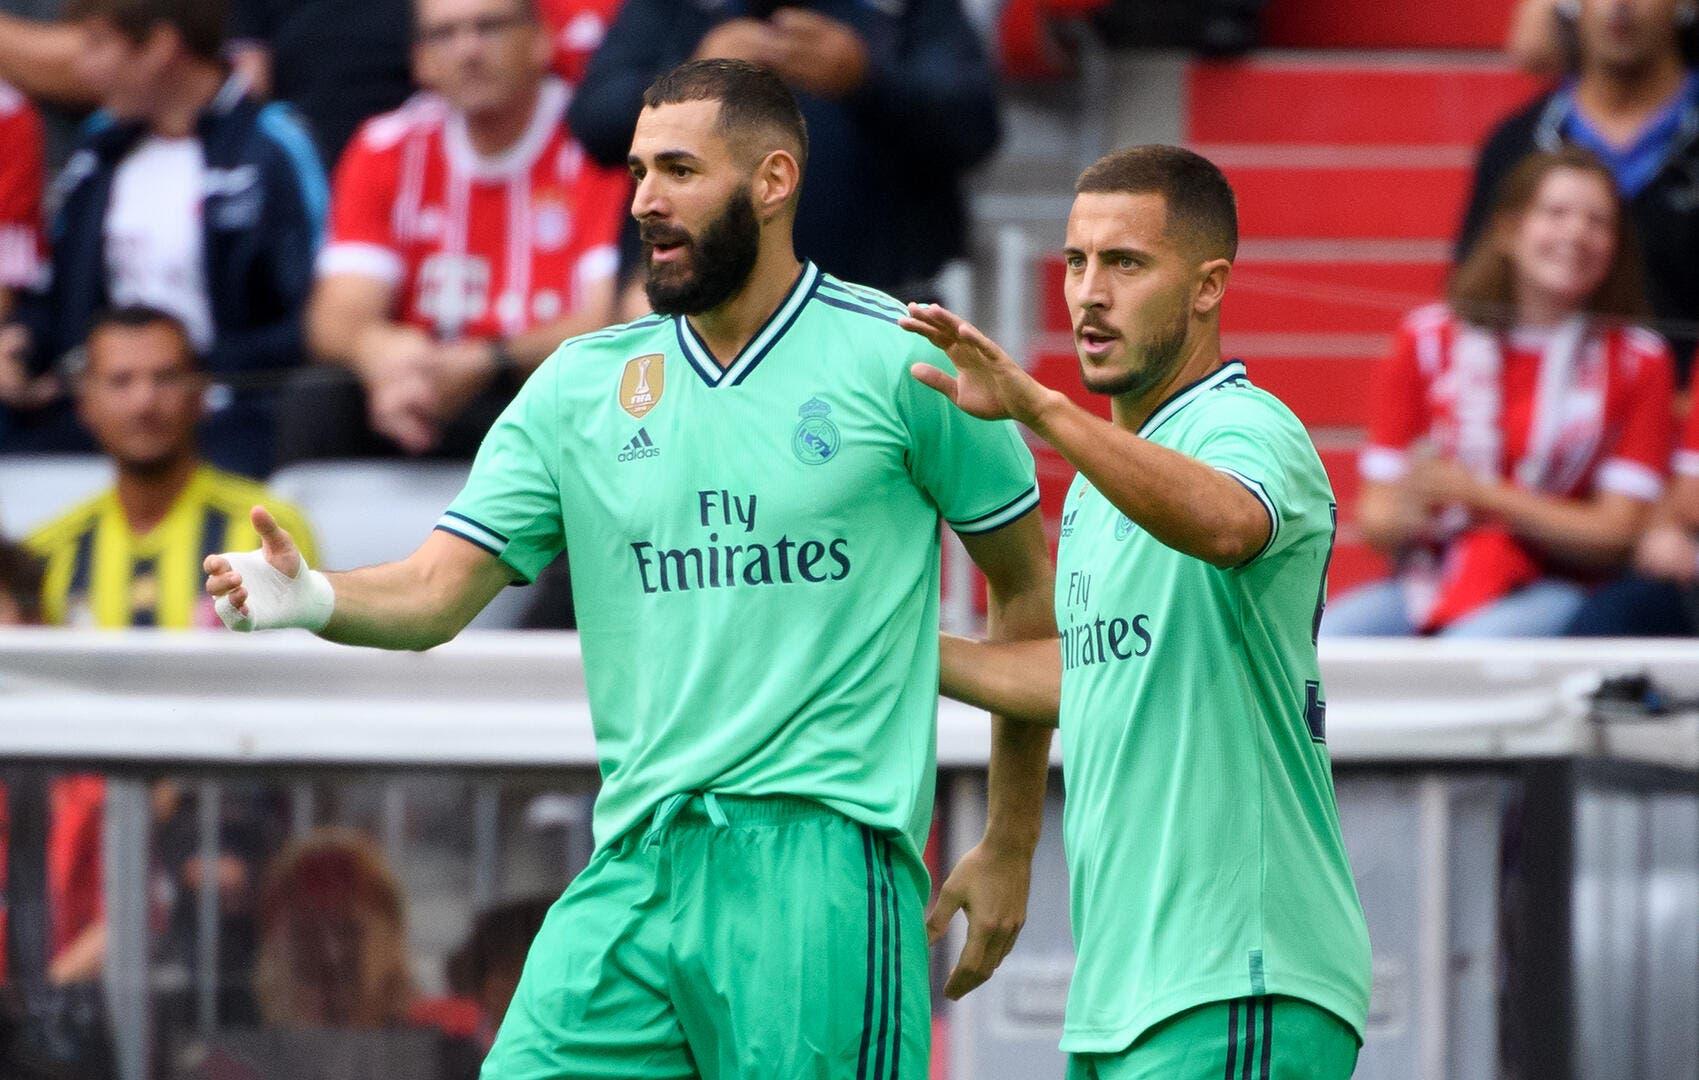 Real : Gros contrat en vue, Benzema met le PSG et l'OL de côté